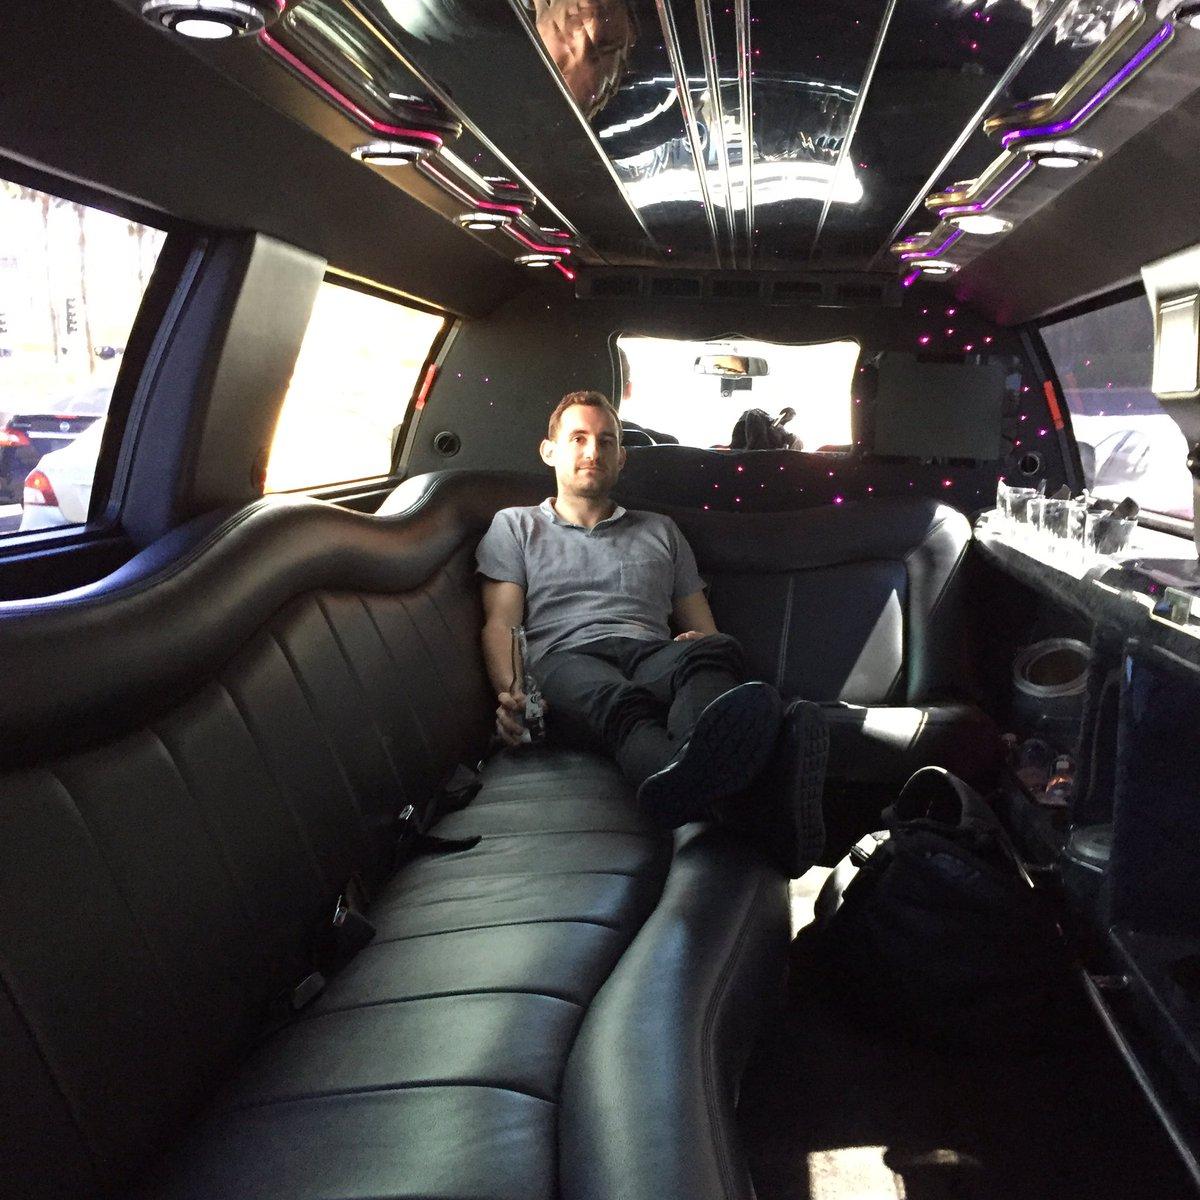 ibnwadie: Cruising to the @WynnLasVegas in style w/ @addressytom #roadToImagine #Magentoimagine https://t.co/ywfvNHHFp2